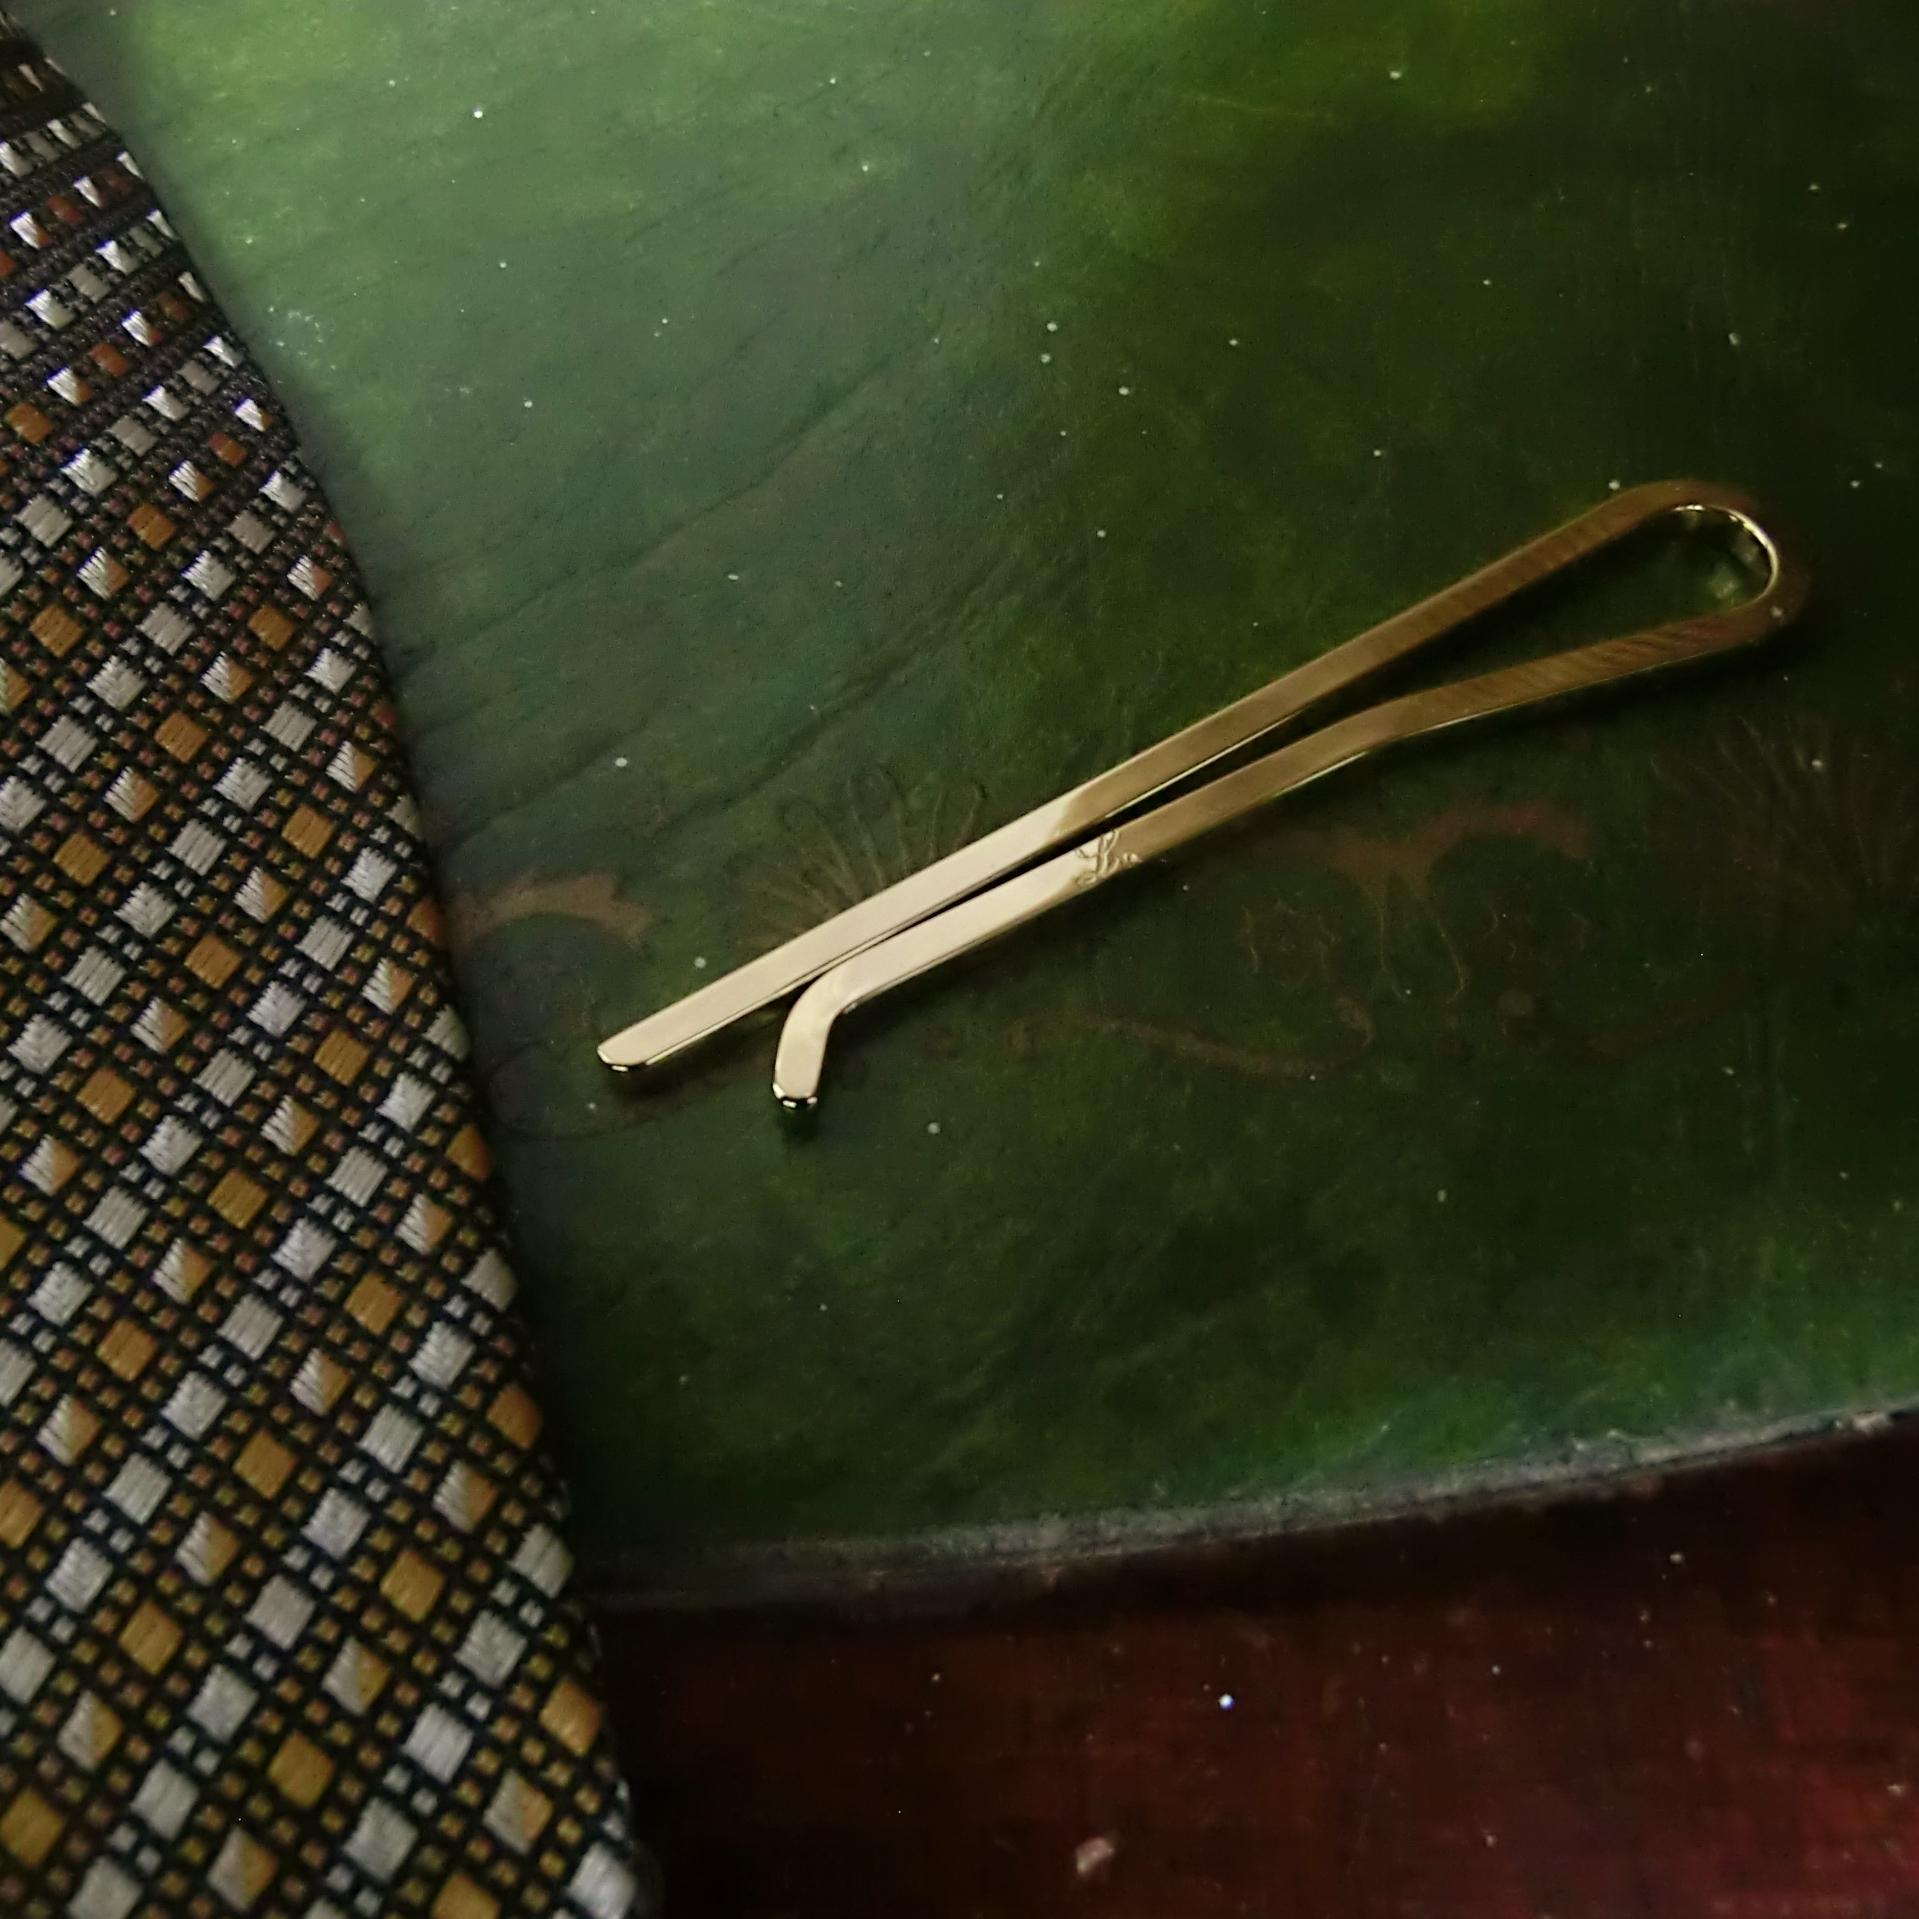 NARROW TIE SLIDE -18K gold plated- ナローネクタイピン 18Kゴールドコーティング